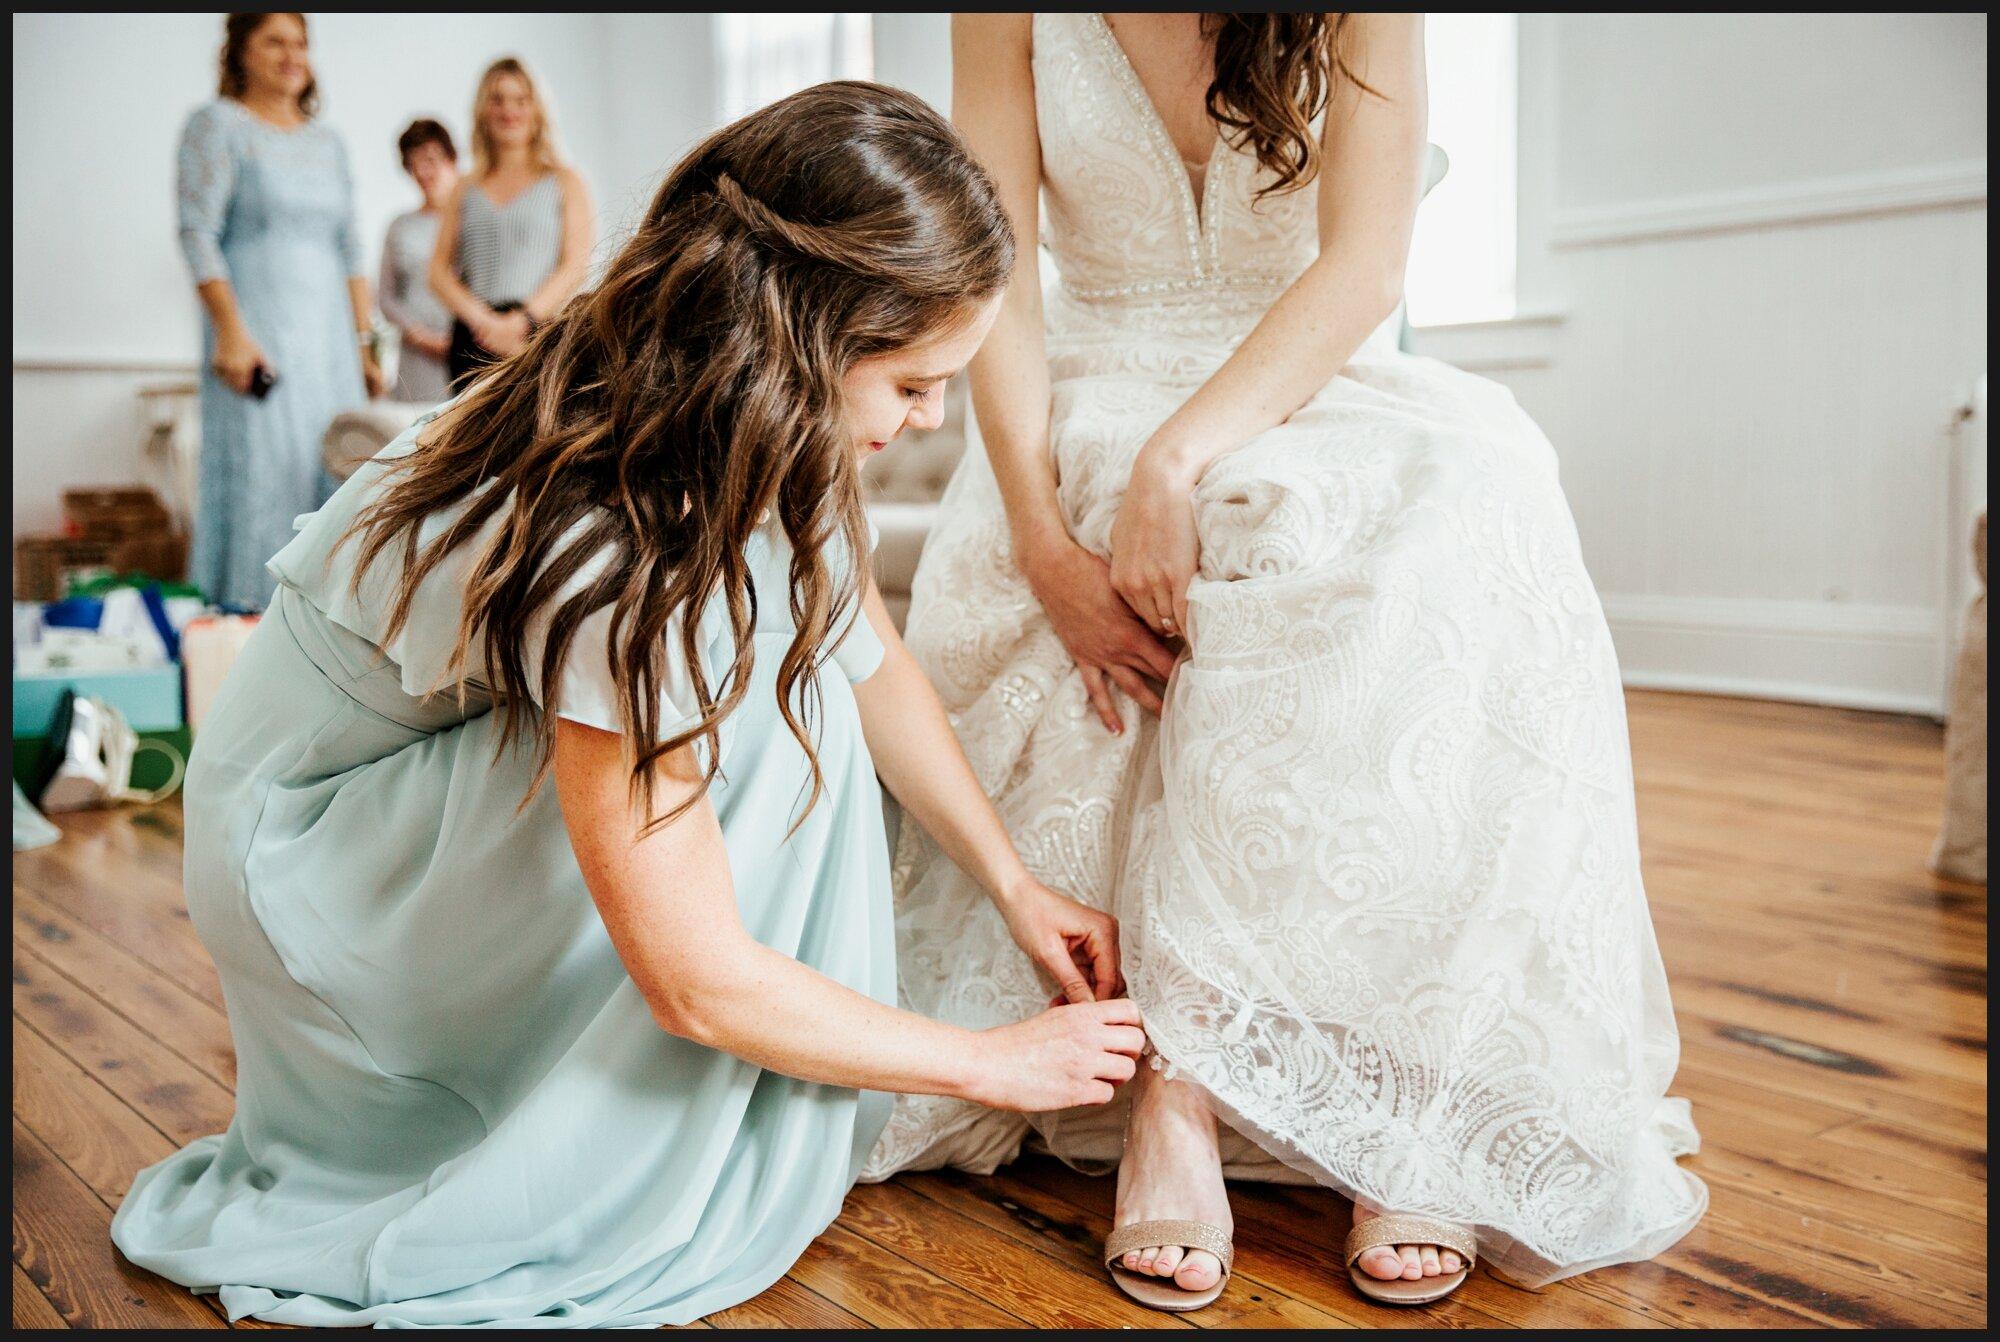 Orlando-Wedding-Photographer-destination-wedding-photographer-florida-wedding-photographer-hawaii-wedding-photographer_0654.jpg